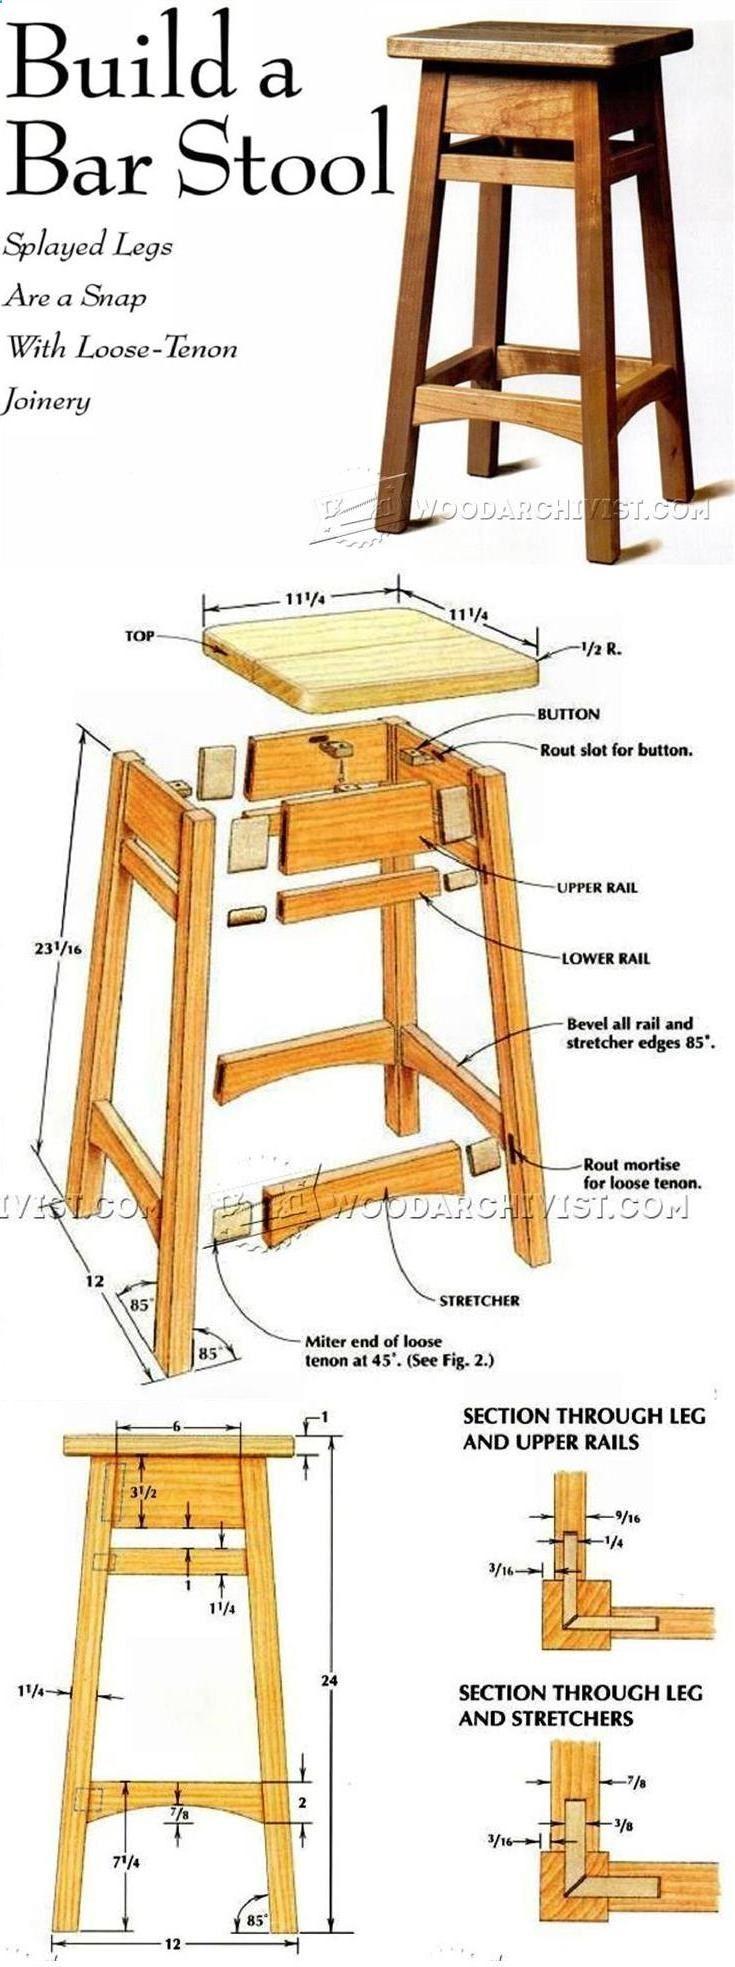 DIY Bar Stool - Furniture Plans and Projects | WoodArchivist.com ...